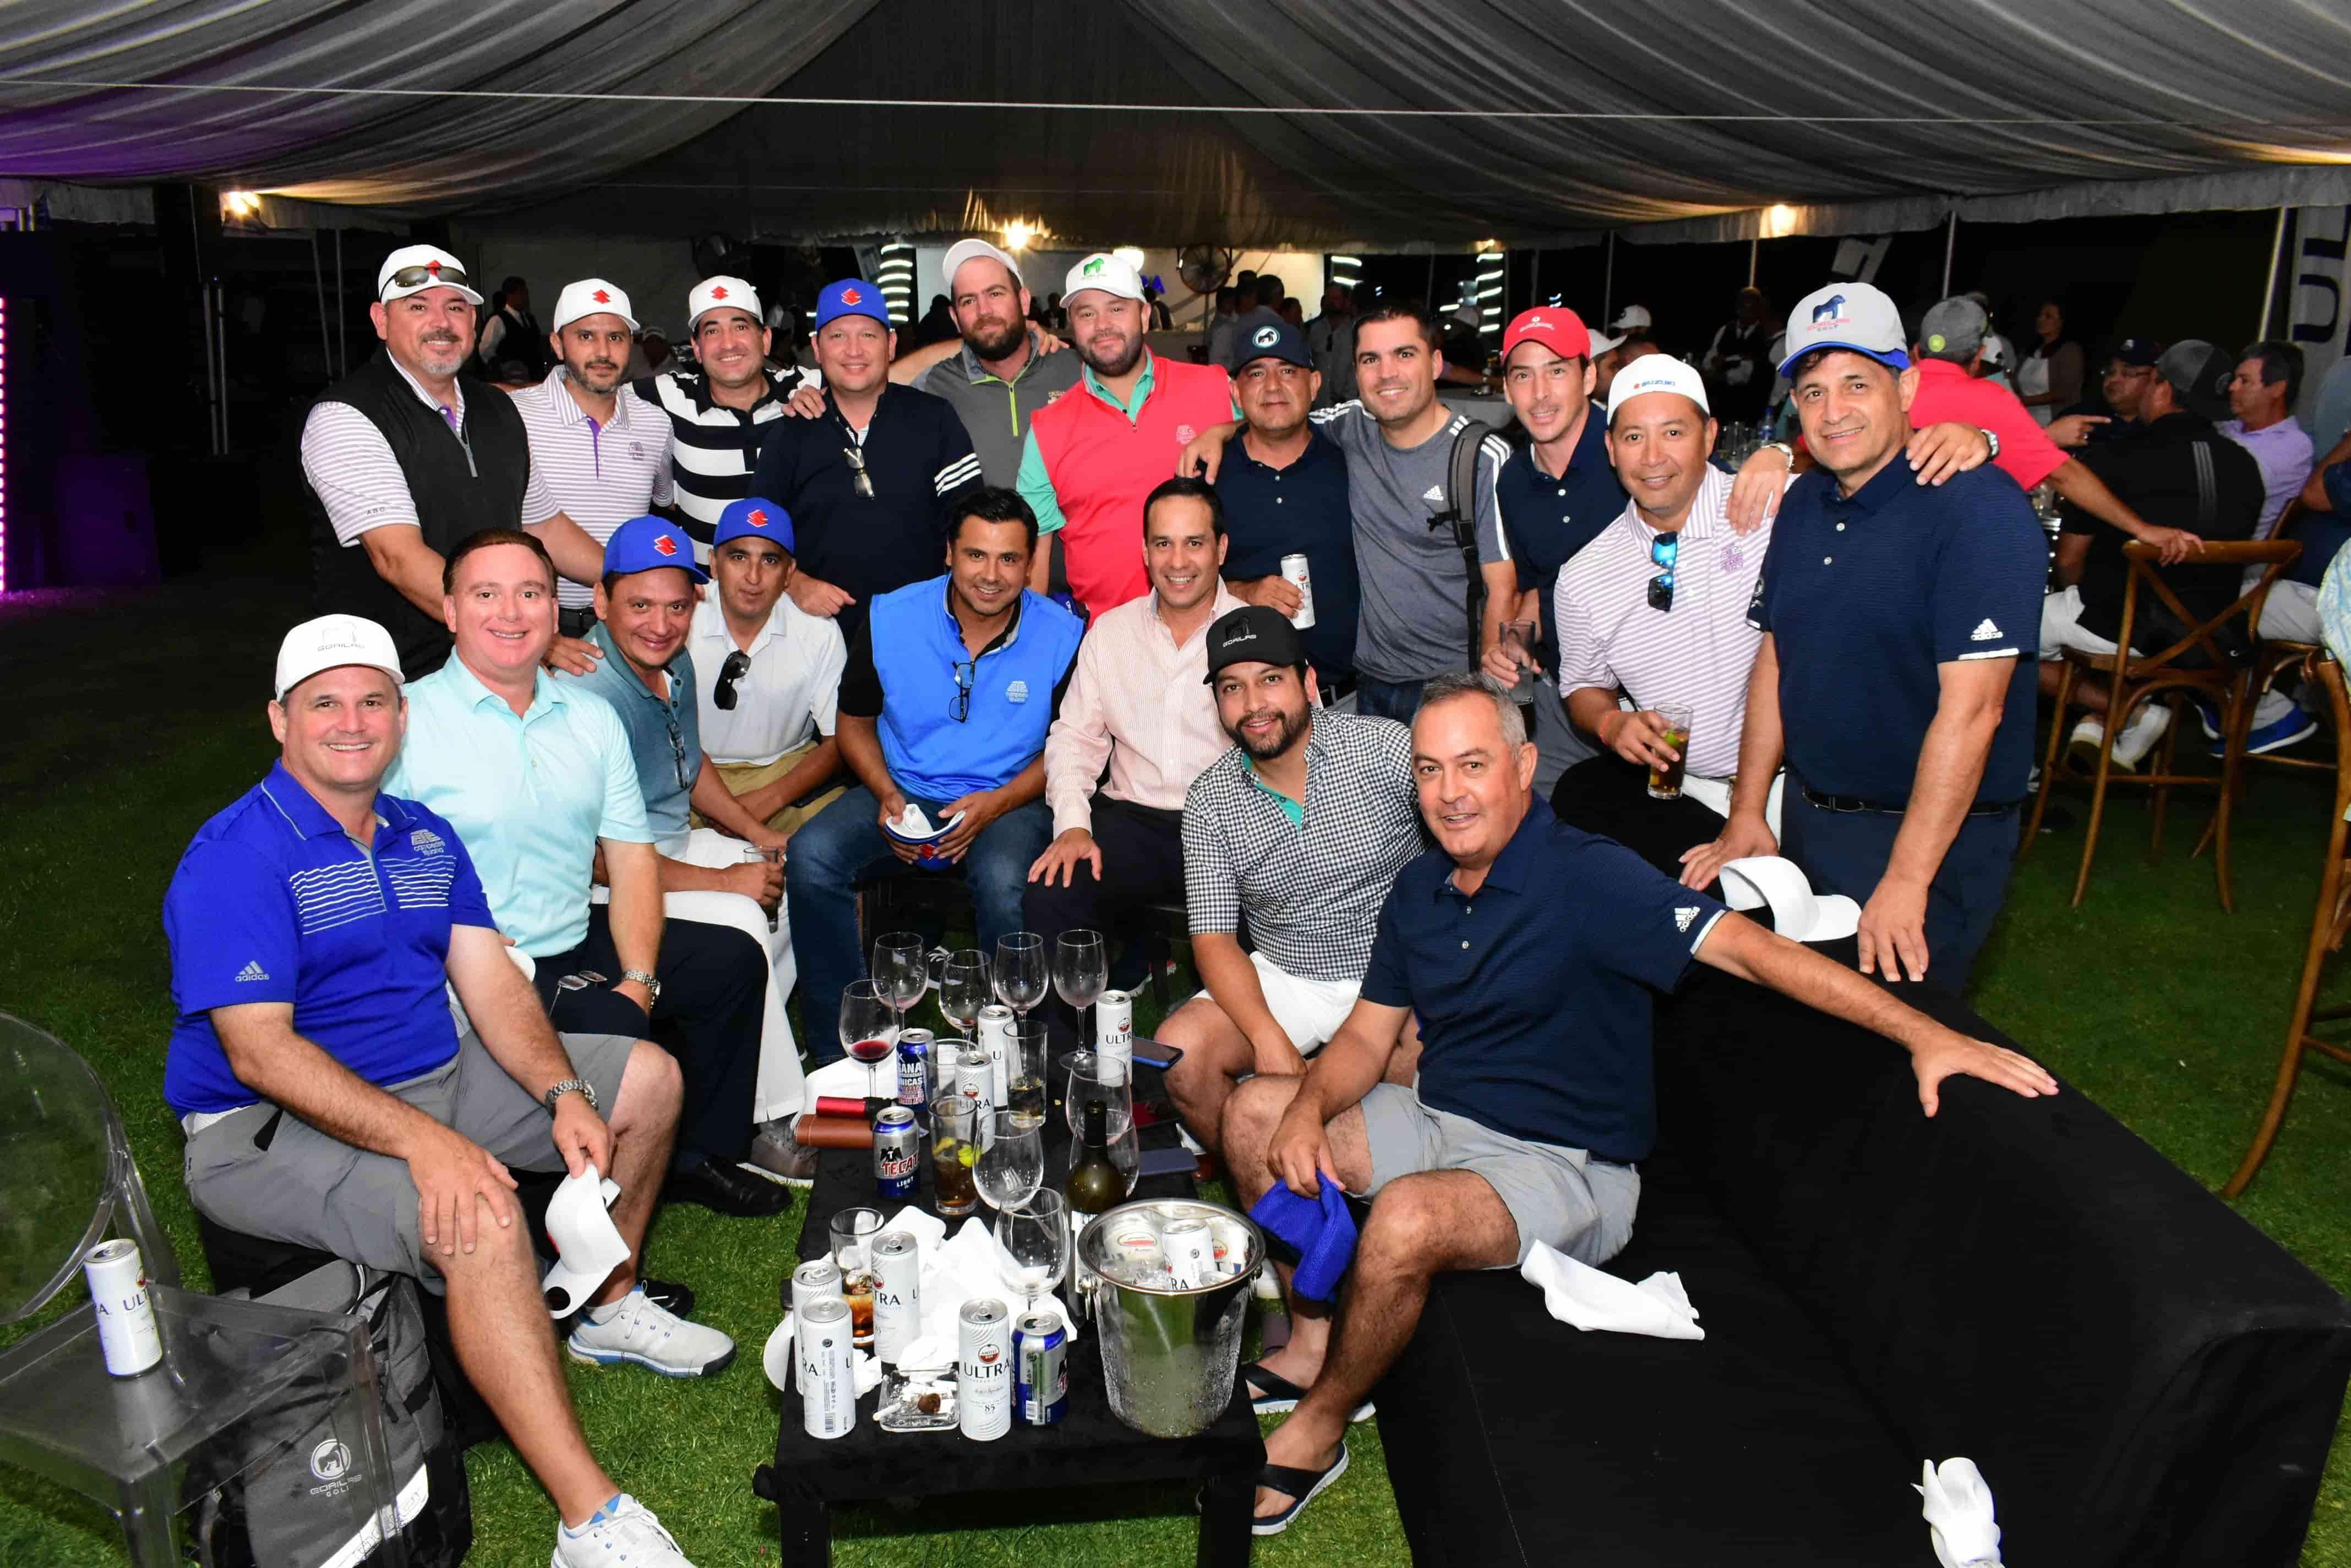 Torneo Golf  de Aniversario LXXI